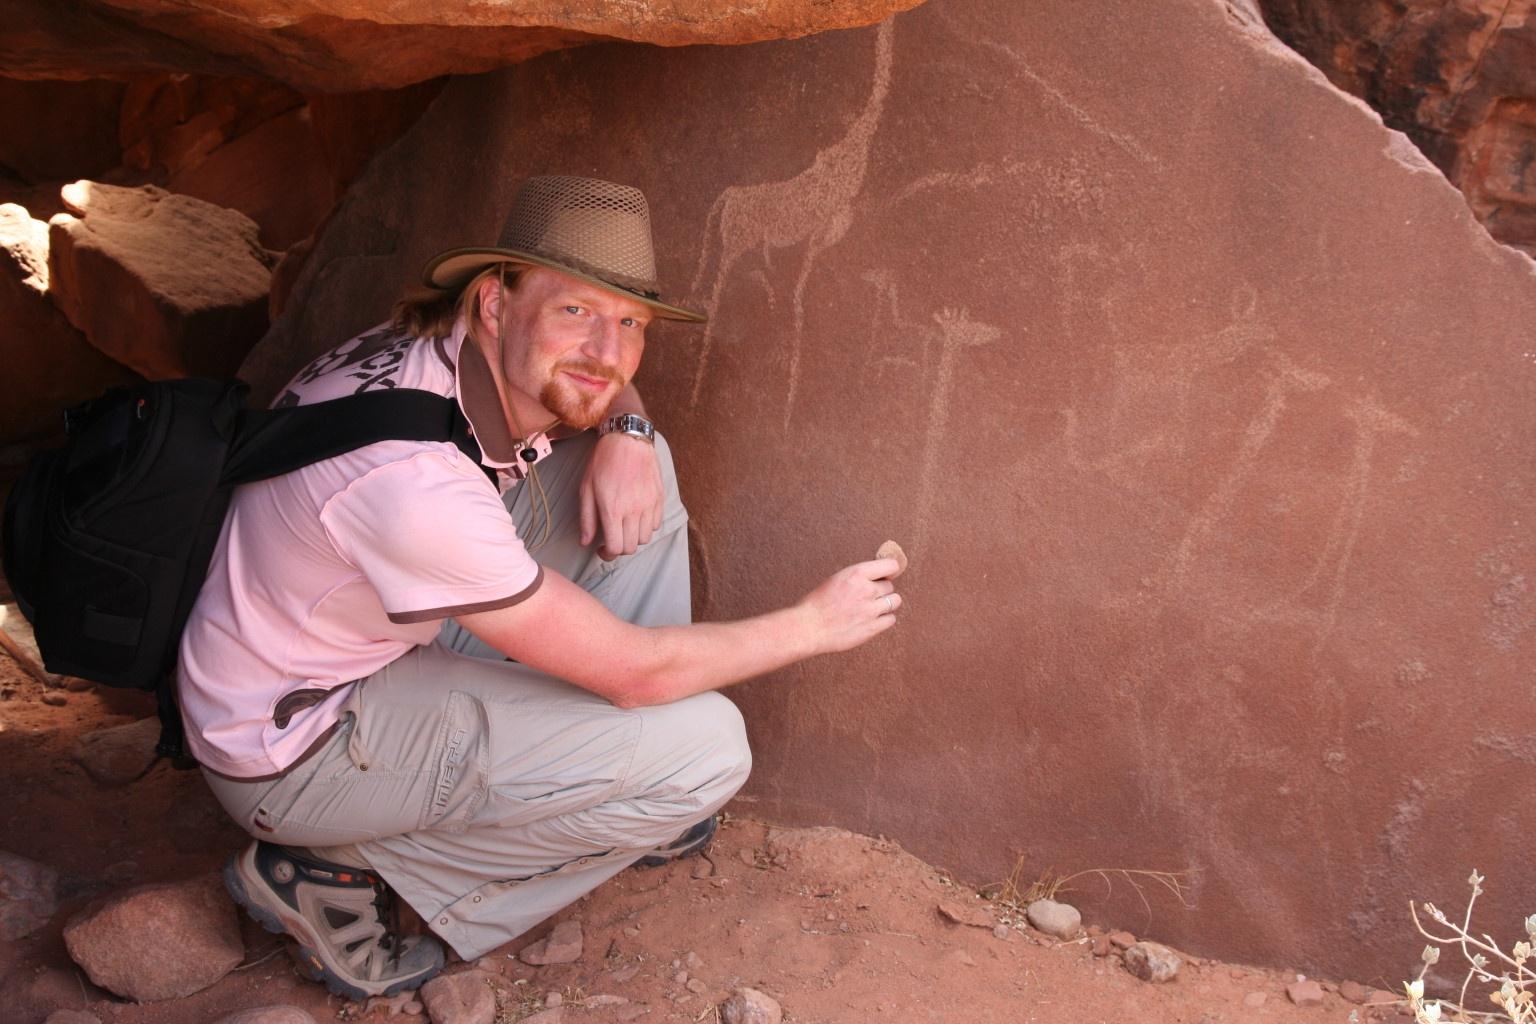 A prehistoric artist